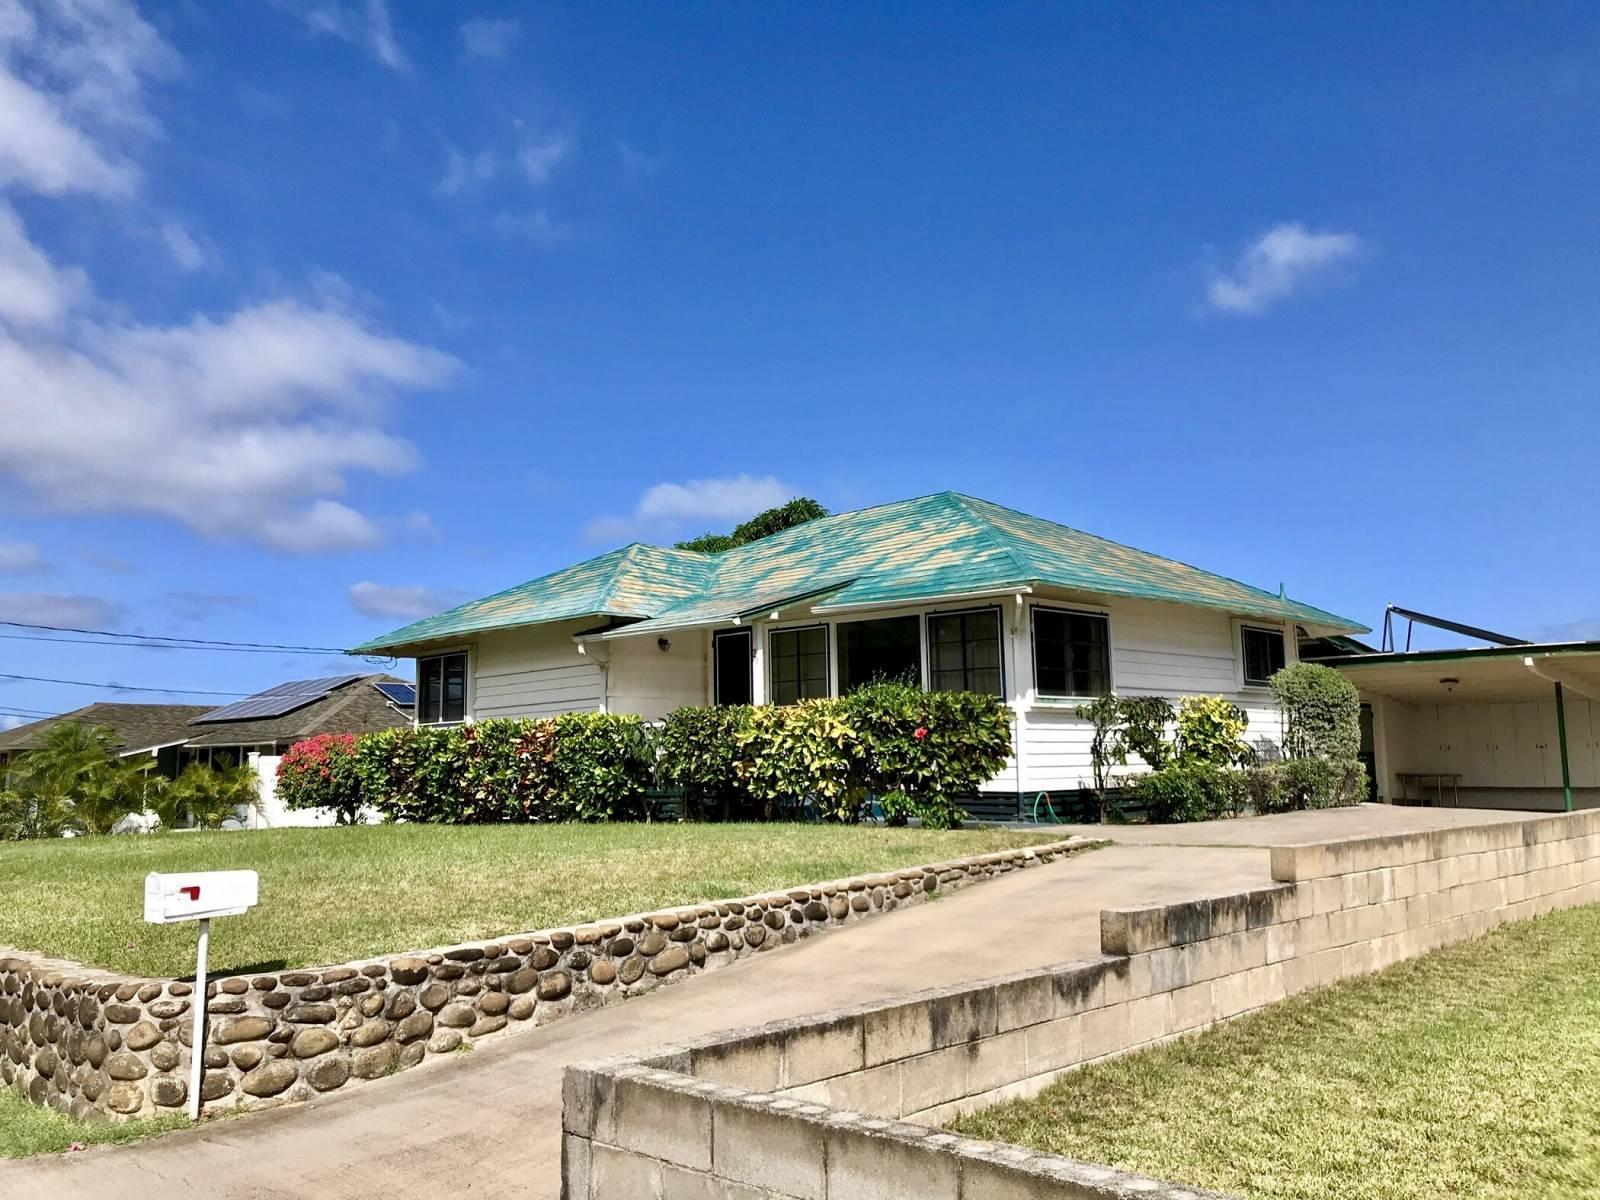 Tips for Buying an Older Maui Home - Hawaii Real Estate ... Hawaiian Sugar Plantation Home Plans on hawaiian cottage floor plans, hawaiian bungalow plans, hawaiian style homes floor plans, hawaiian style house plans, hawaiian home building plans,